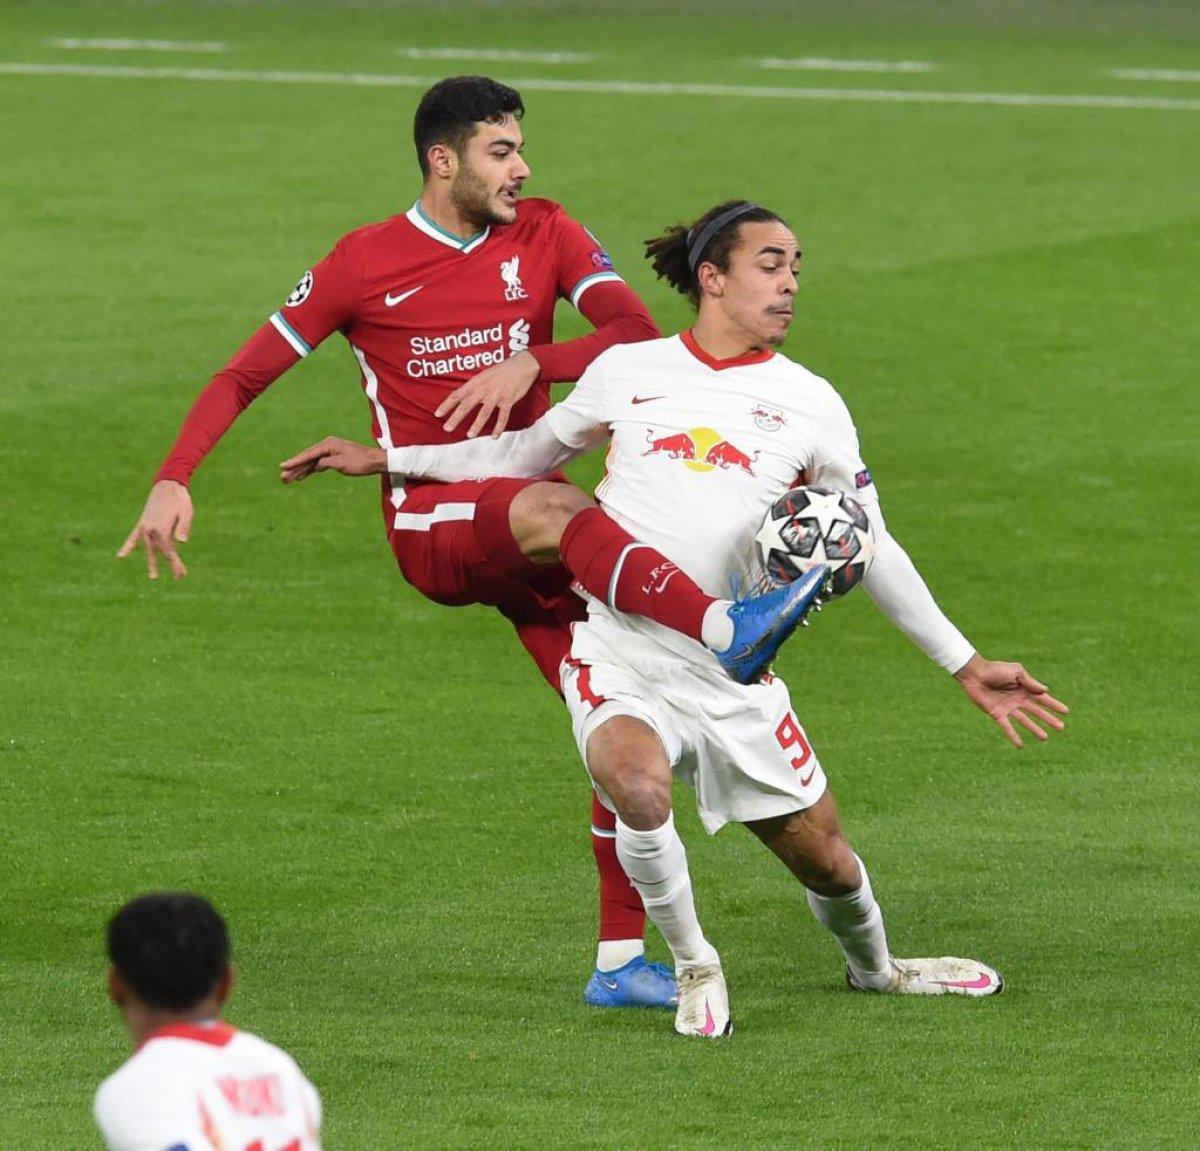 Mohamed Salah tan Ozan Kabak a övgü #1